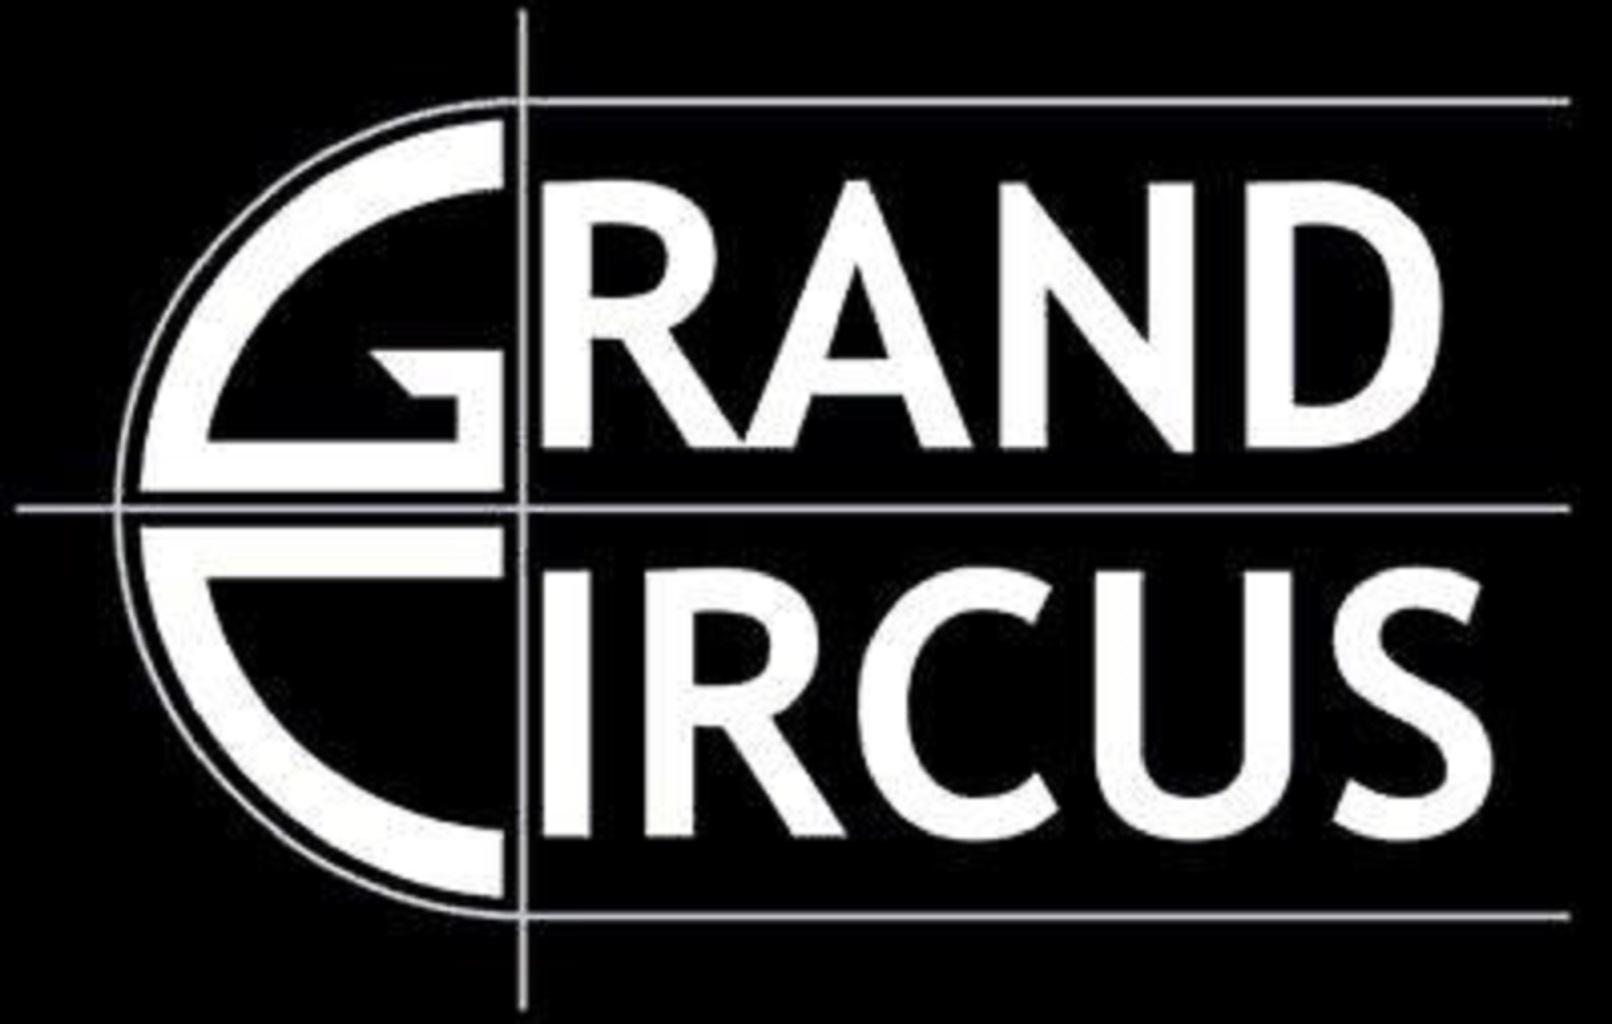 Grand_Circus